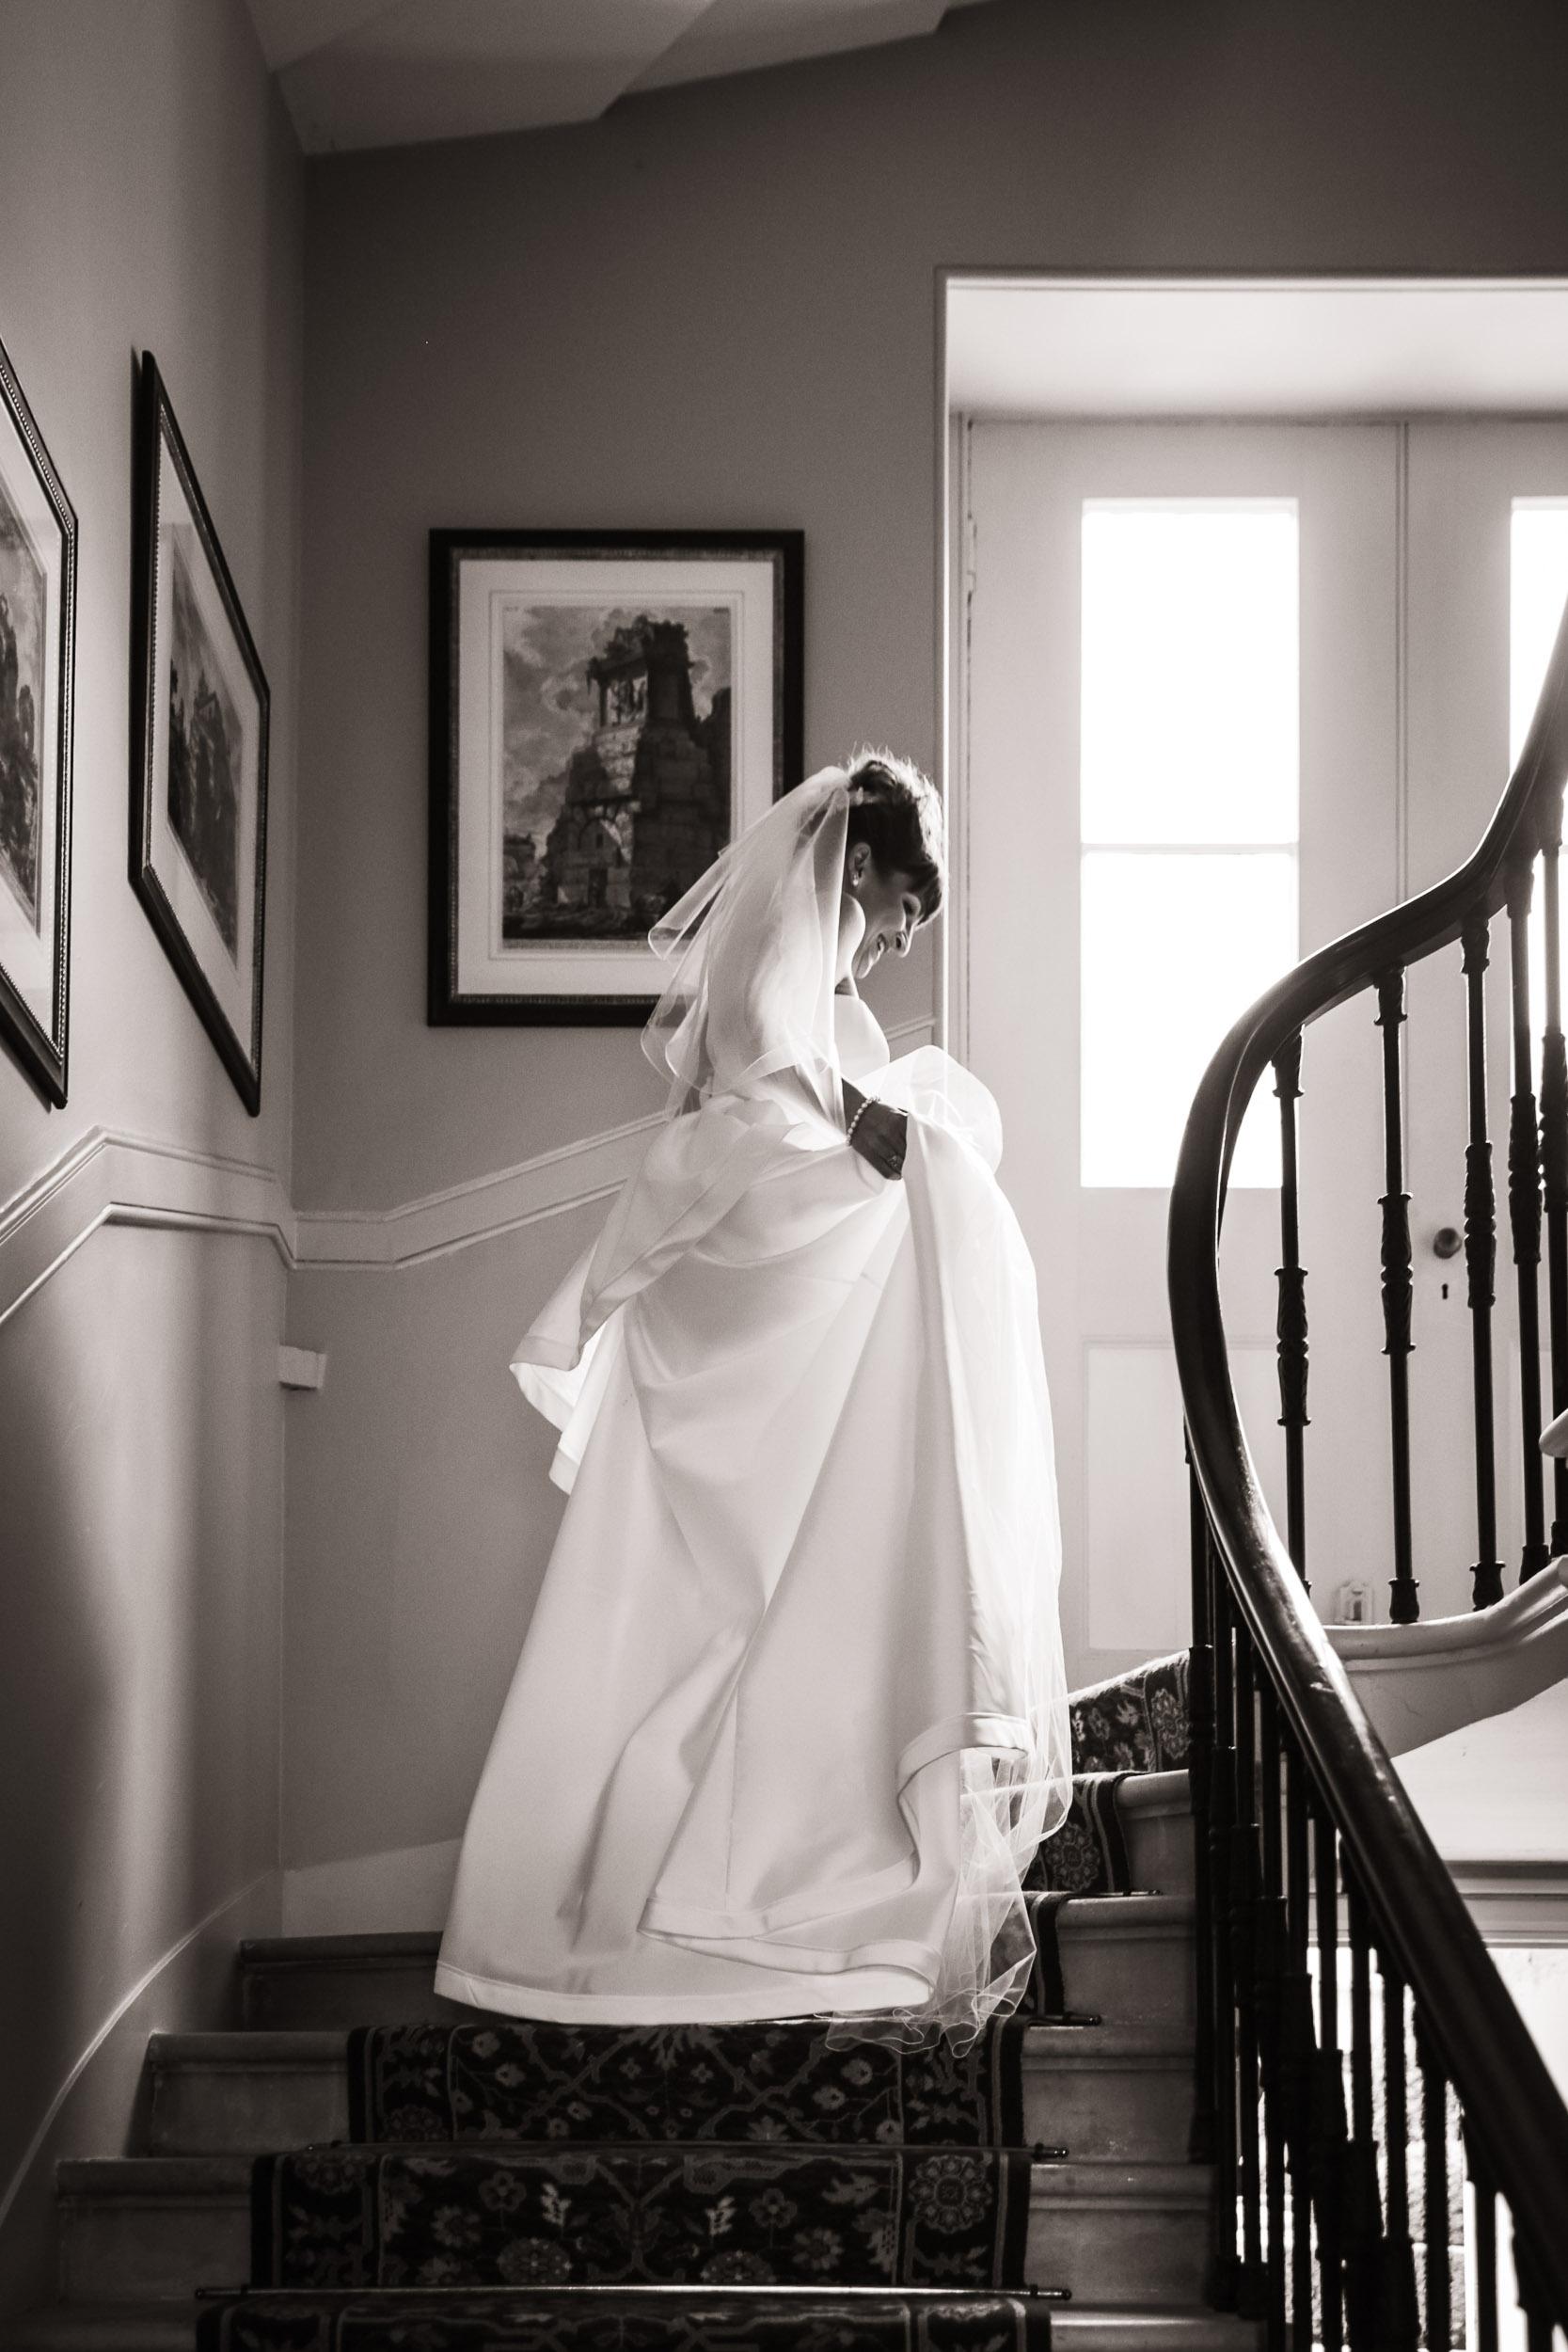 syon-house-wedding-photographer-london 040.jpg